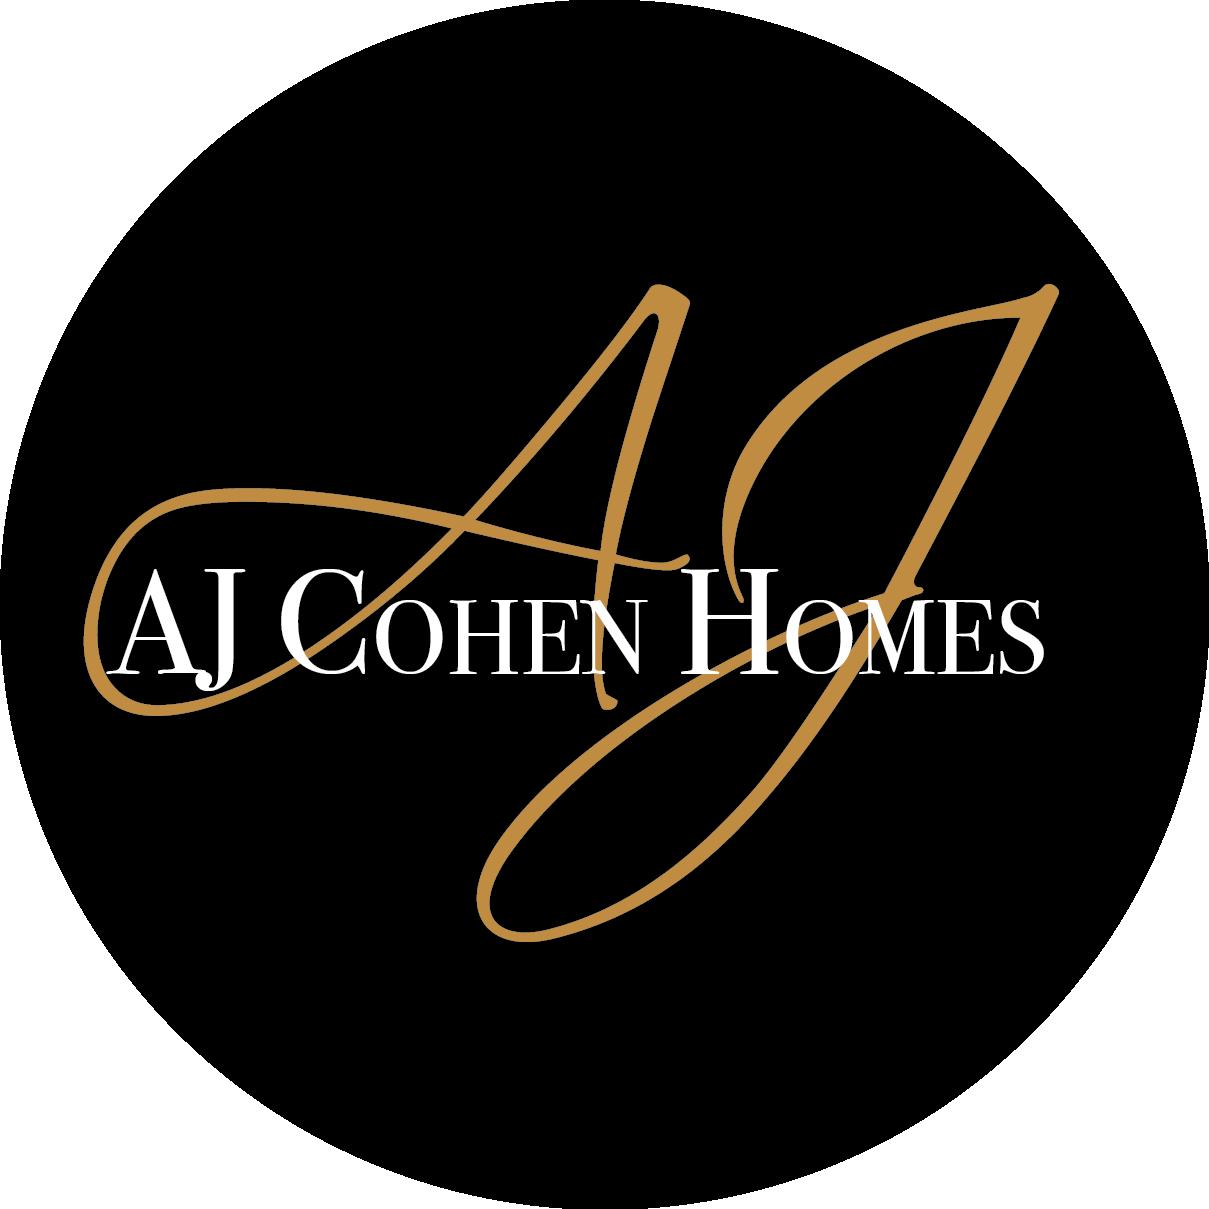 AJ Cohen Homes